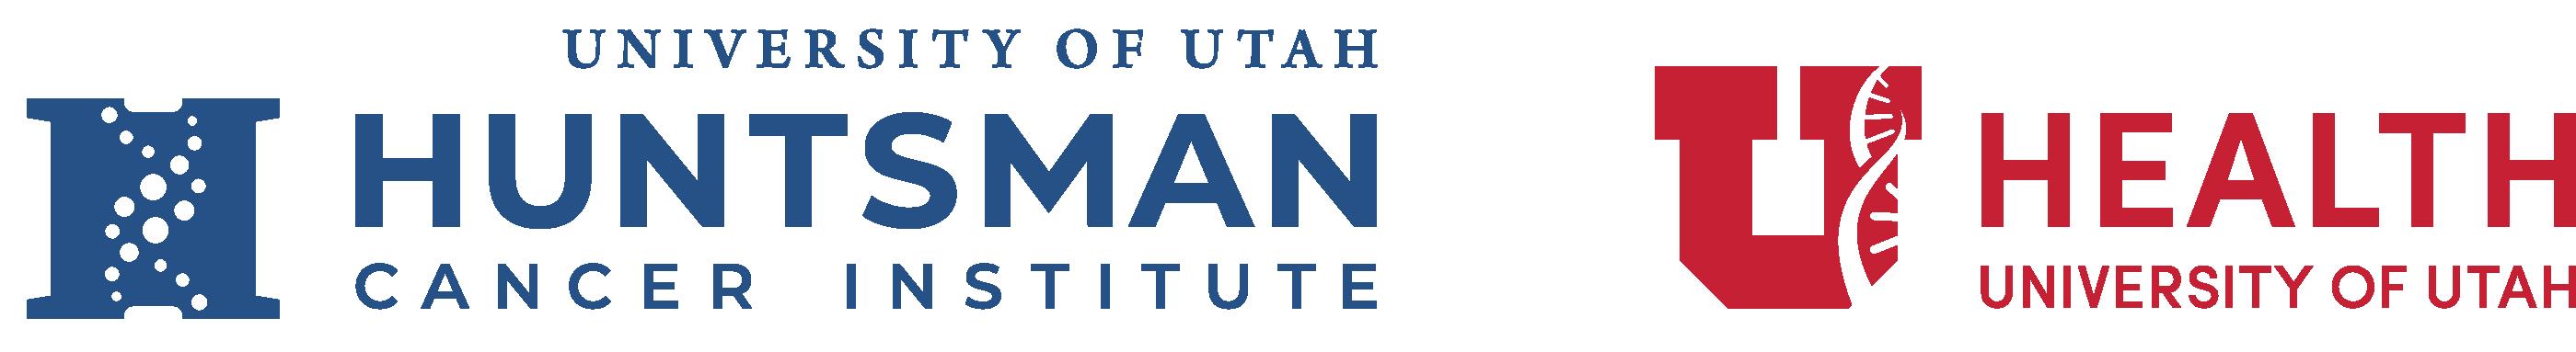 Huntsman Cancer Institute at the University of Utah